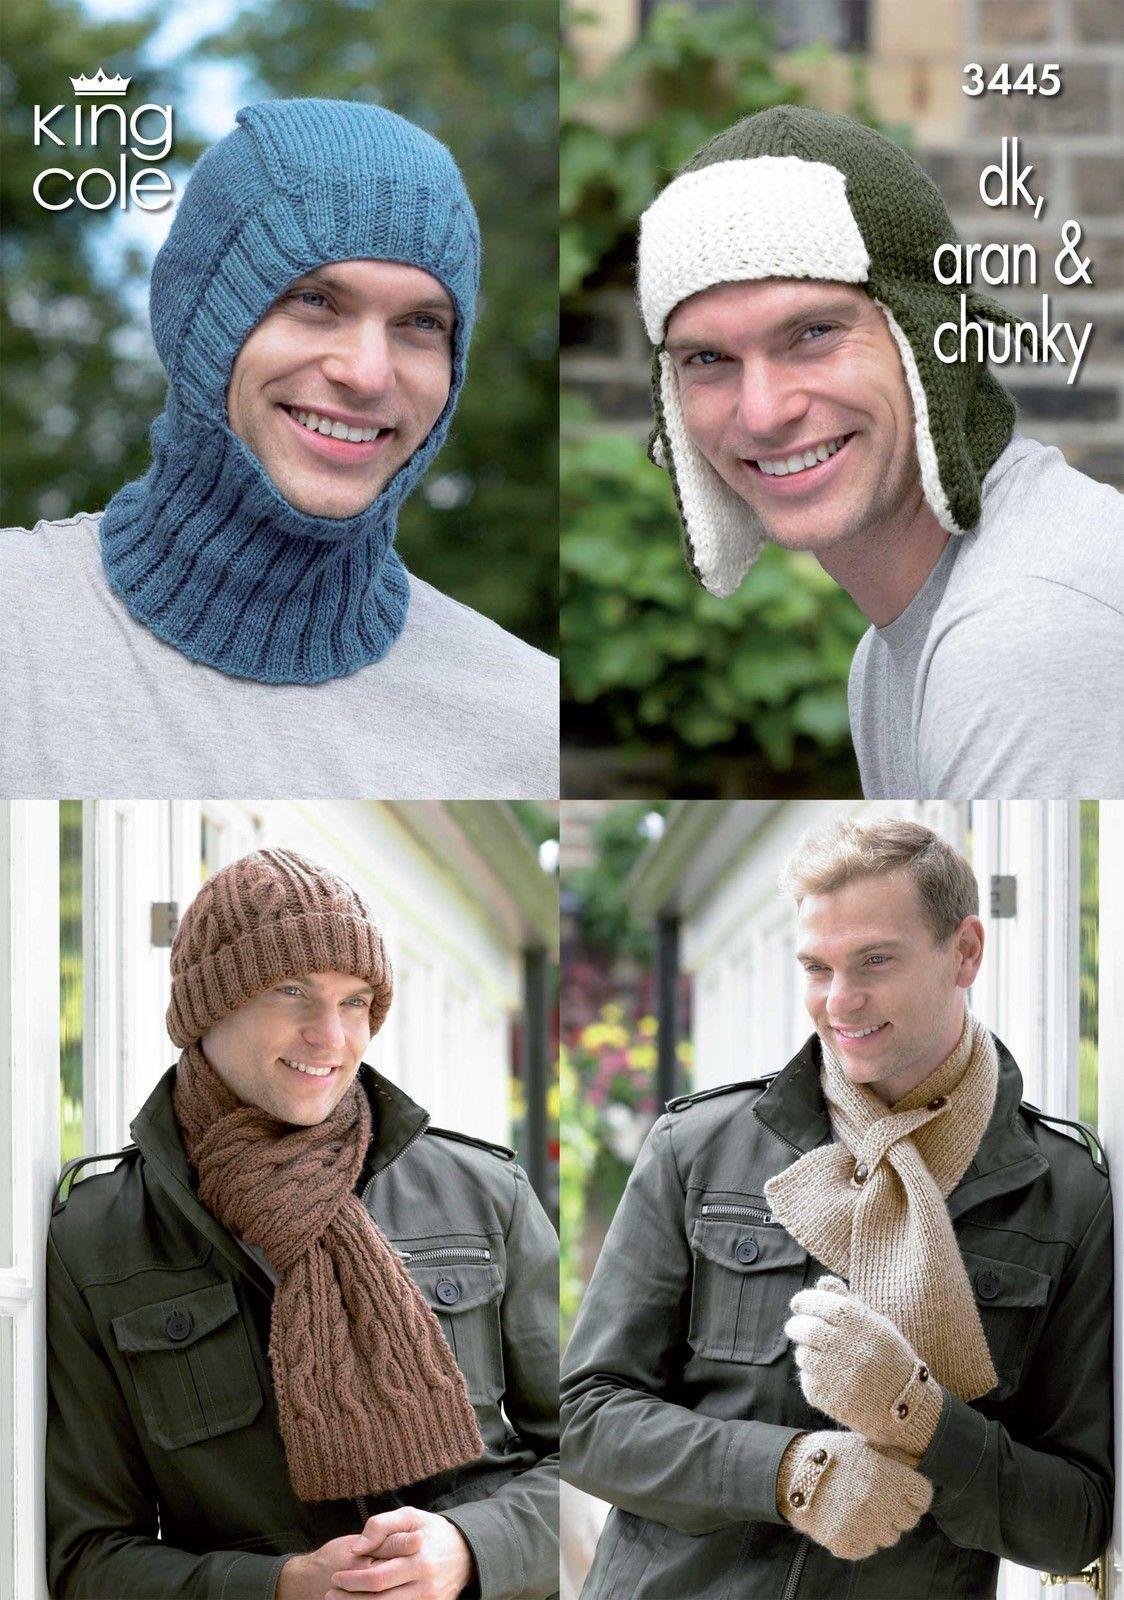 3445-king-cole-dk-aran-chunky-hat-balaclava-scarf-gloves-knitting -pattern-91249-p.jpg 6b45fcdeb65